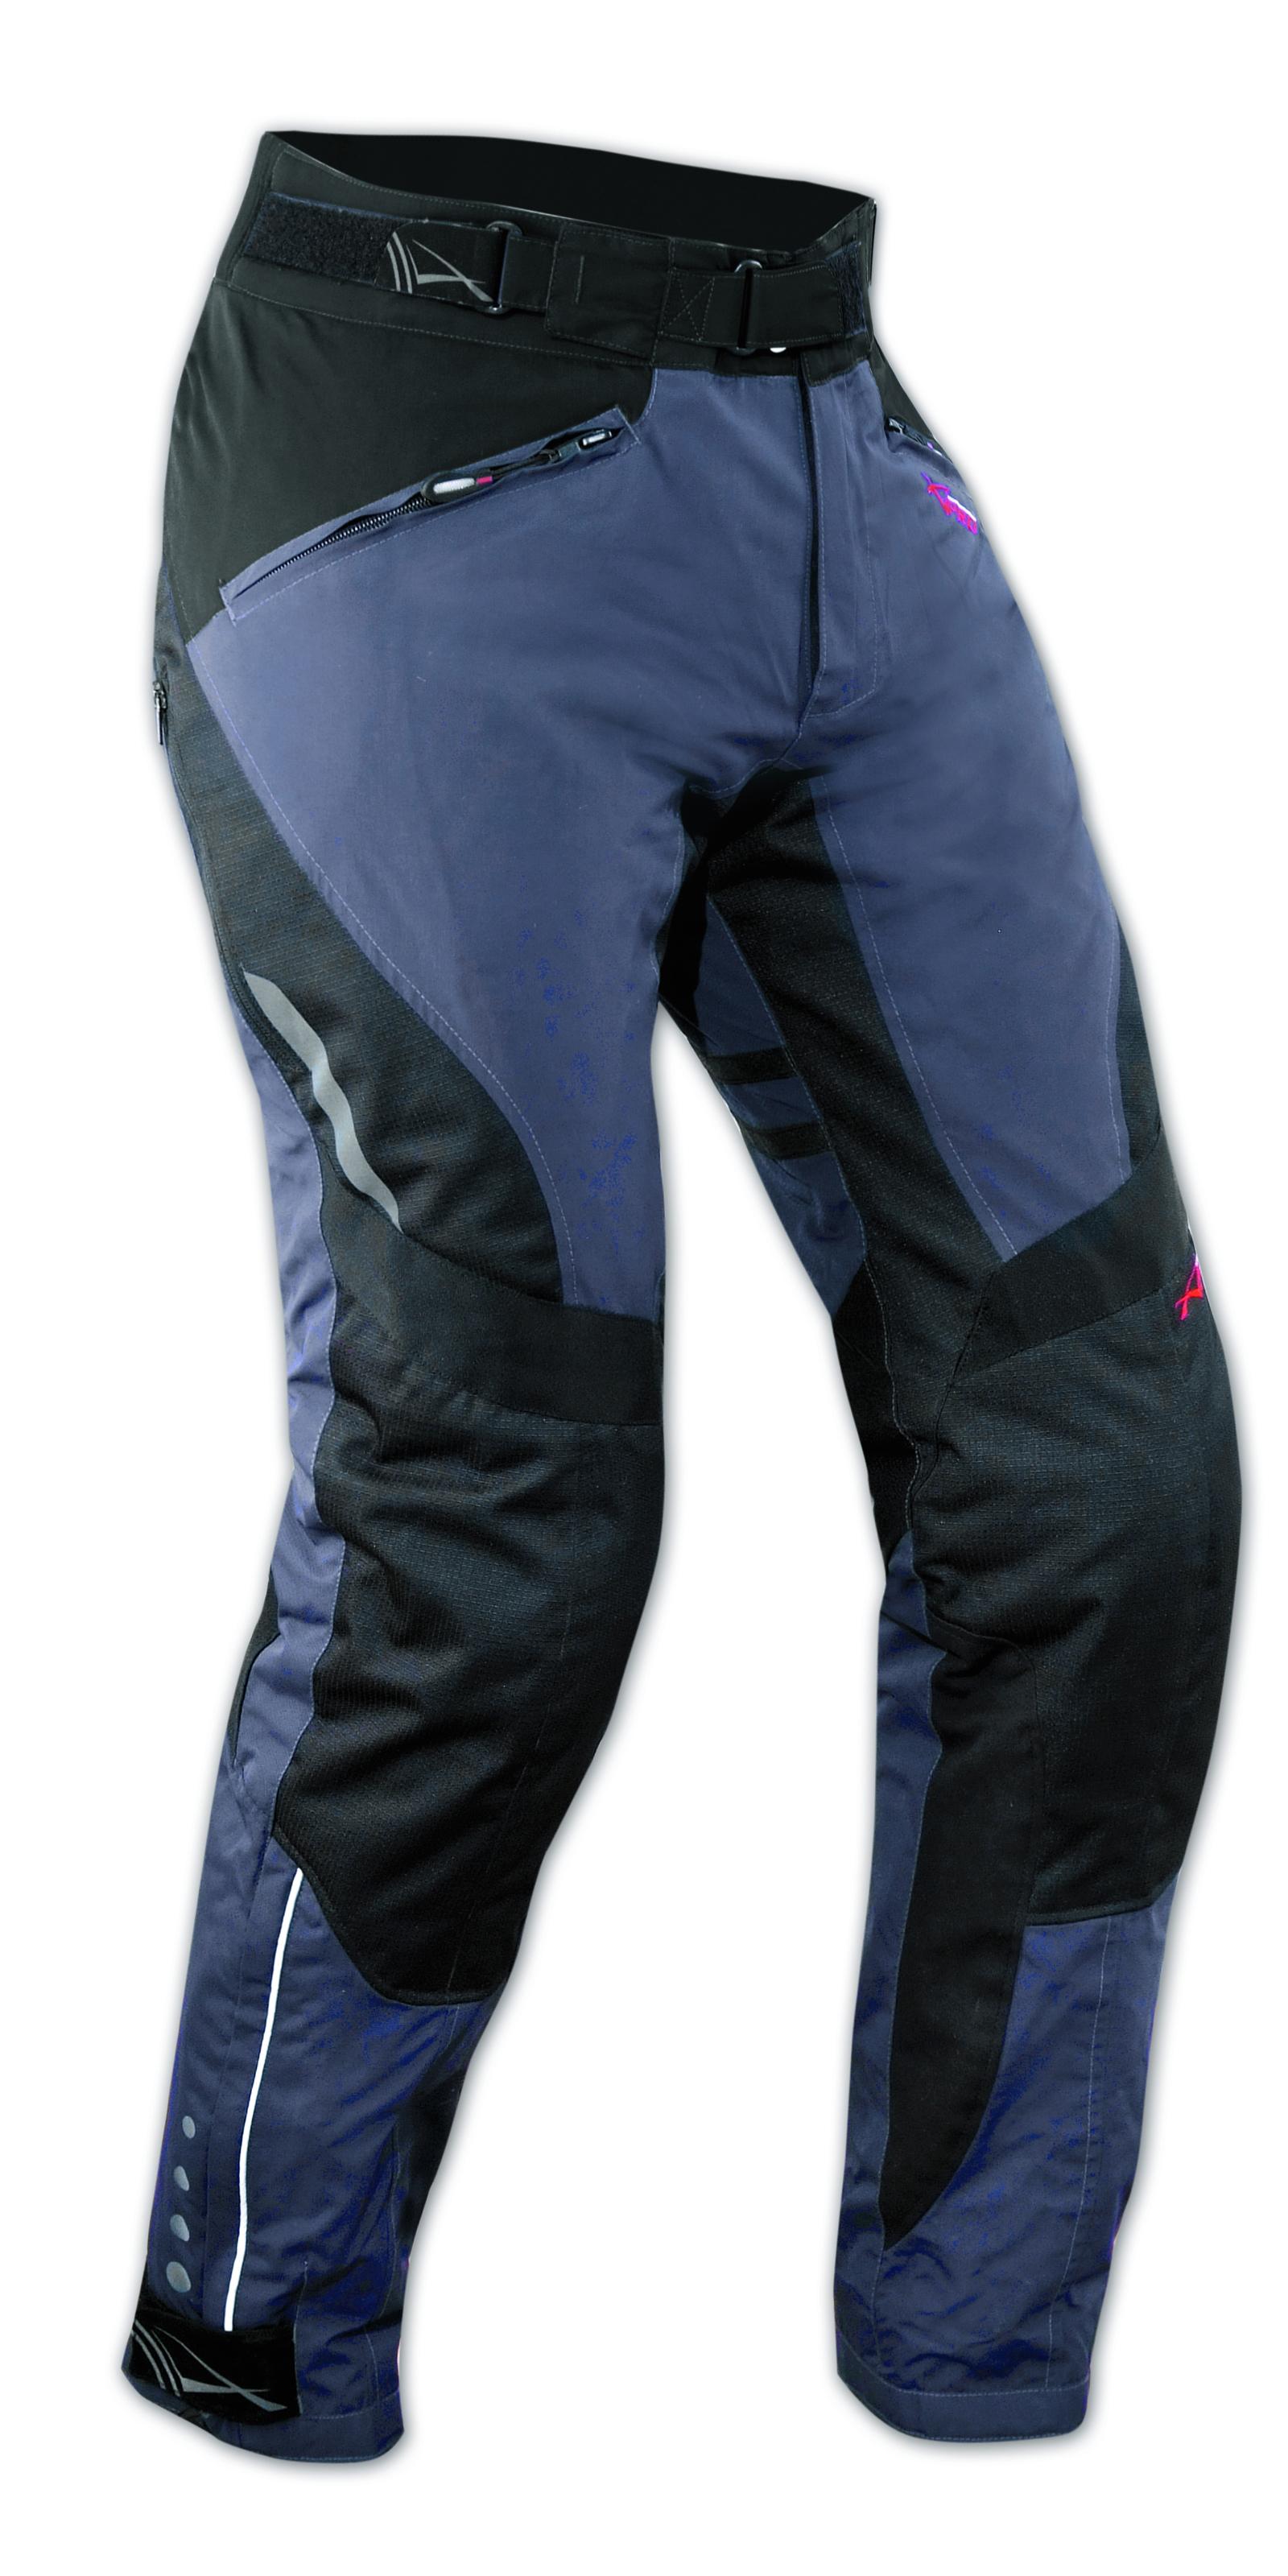 Pantaloni-Donna-Lady-Impermeabile-Moto-Imbottitura-Termica-Estraibile-Blu